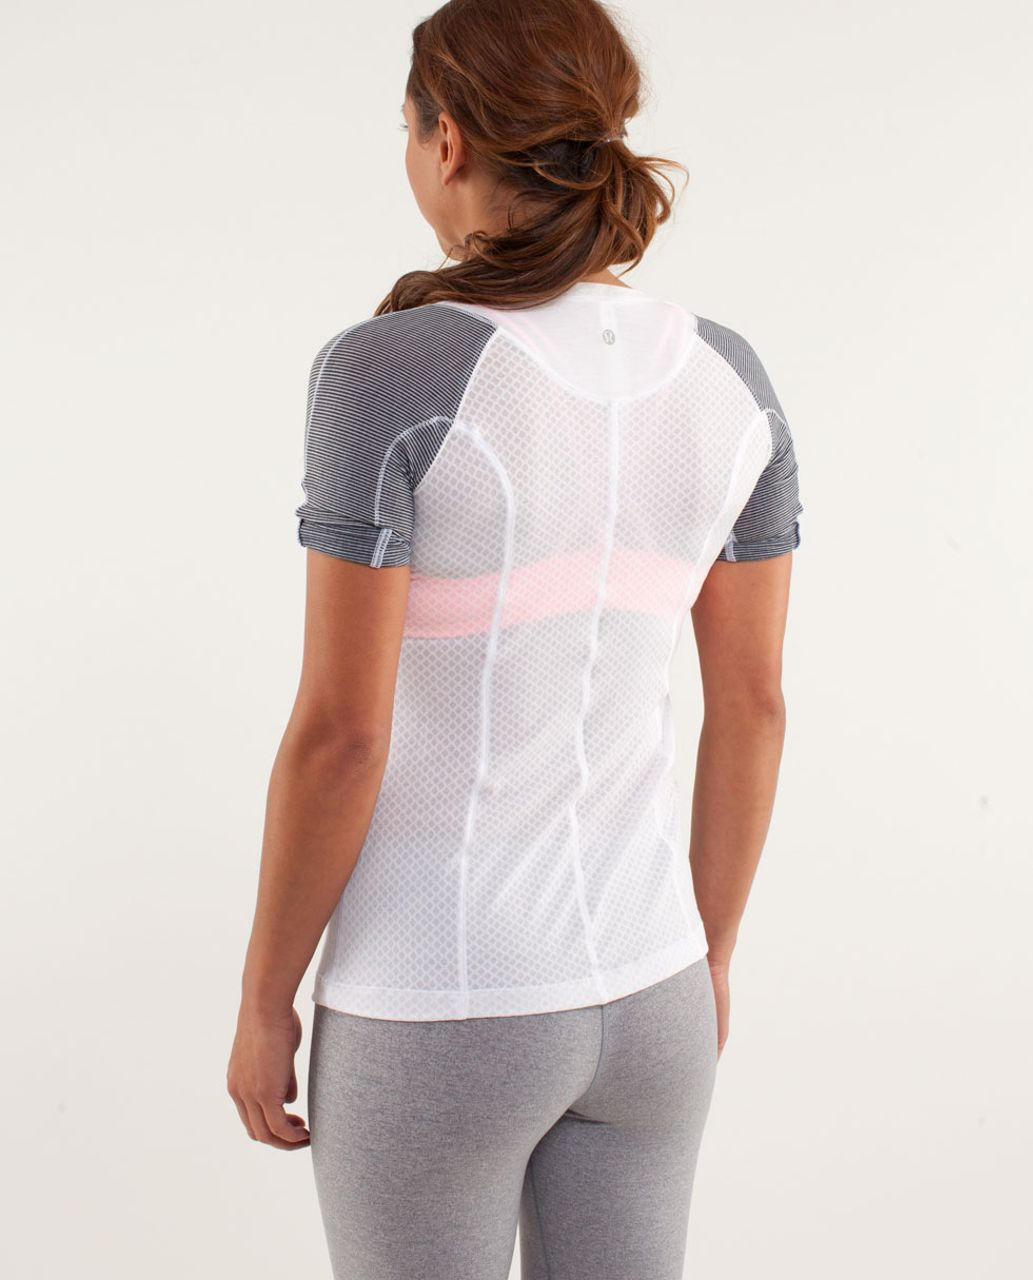 Lululemon Puri Tee Short Sleeve - Mesh Burnout White / White / Tonka Stripe Inkwell